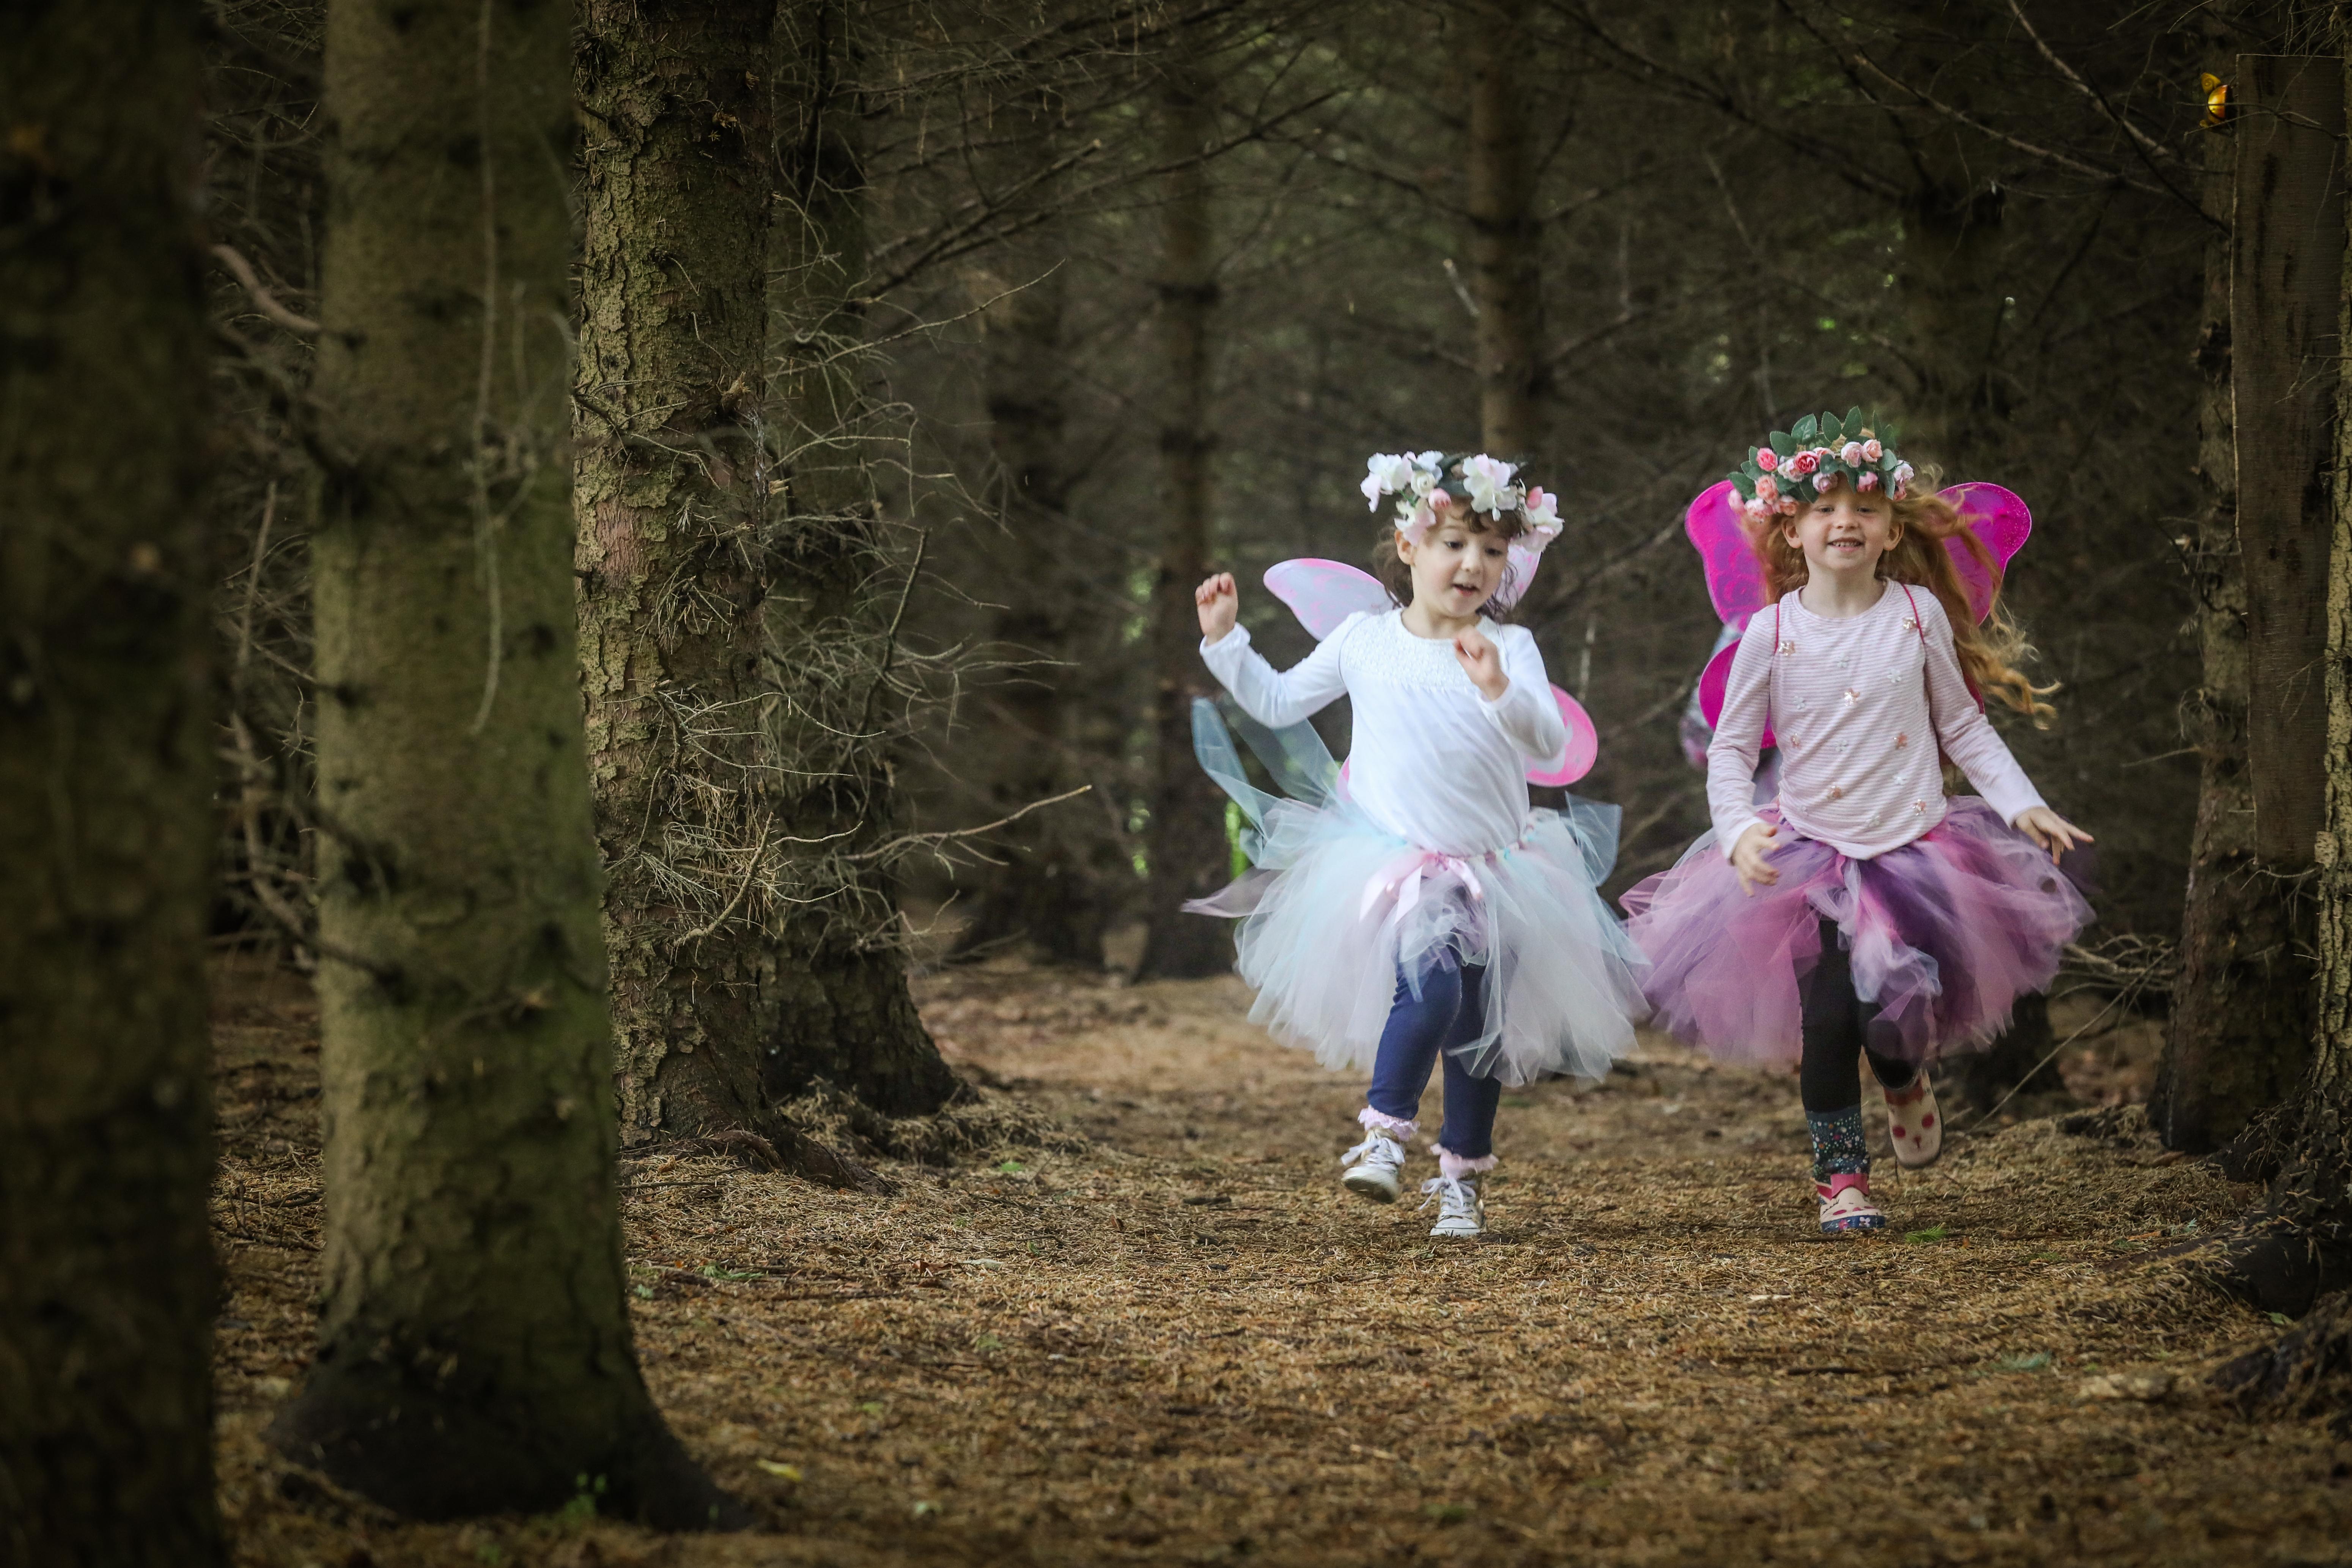 Little fairies at Brechin Castle.